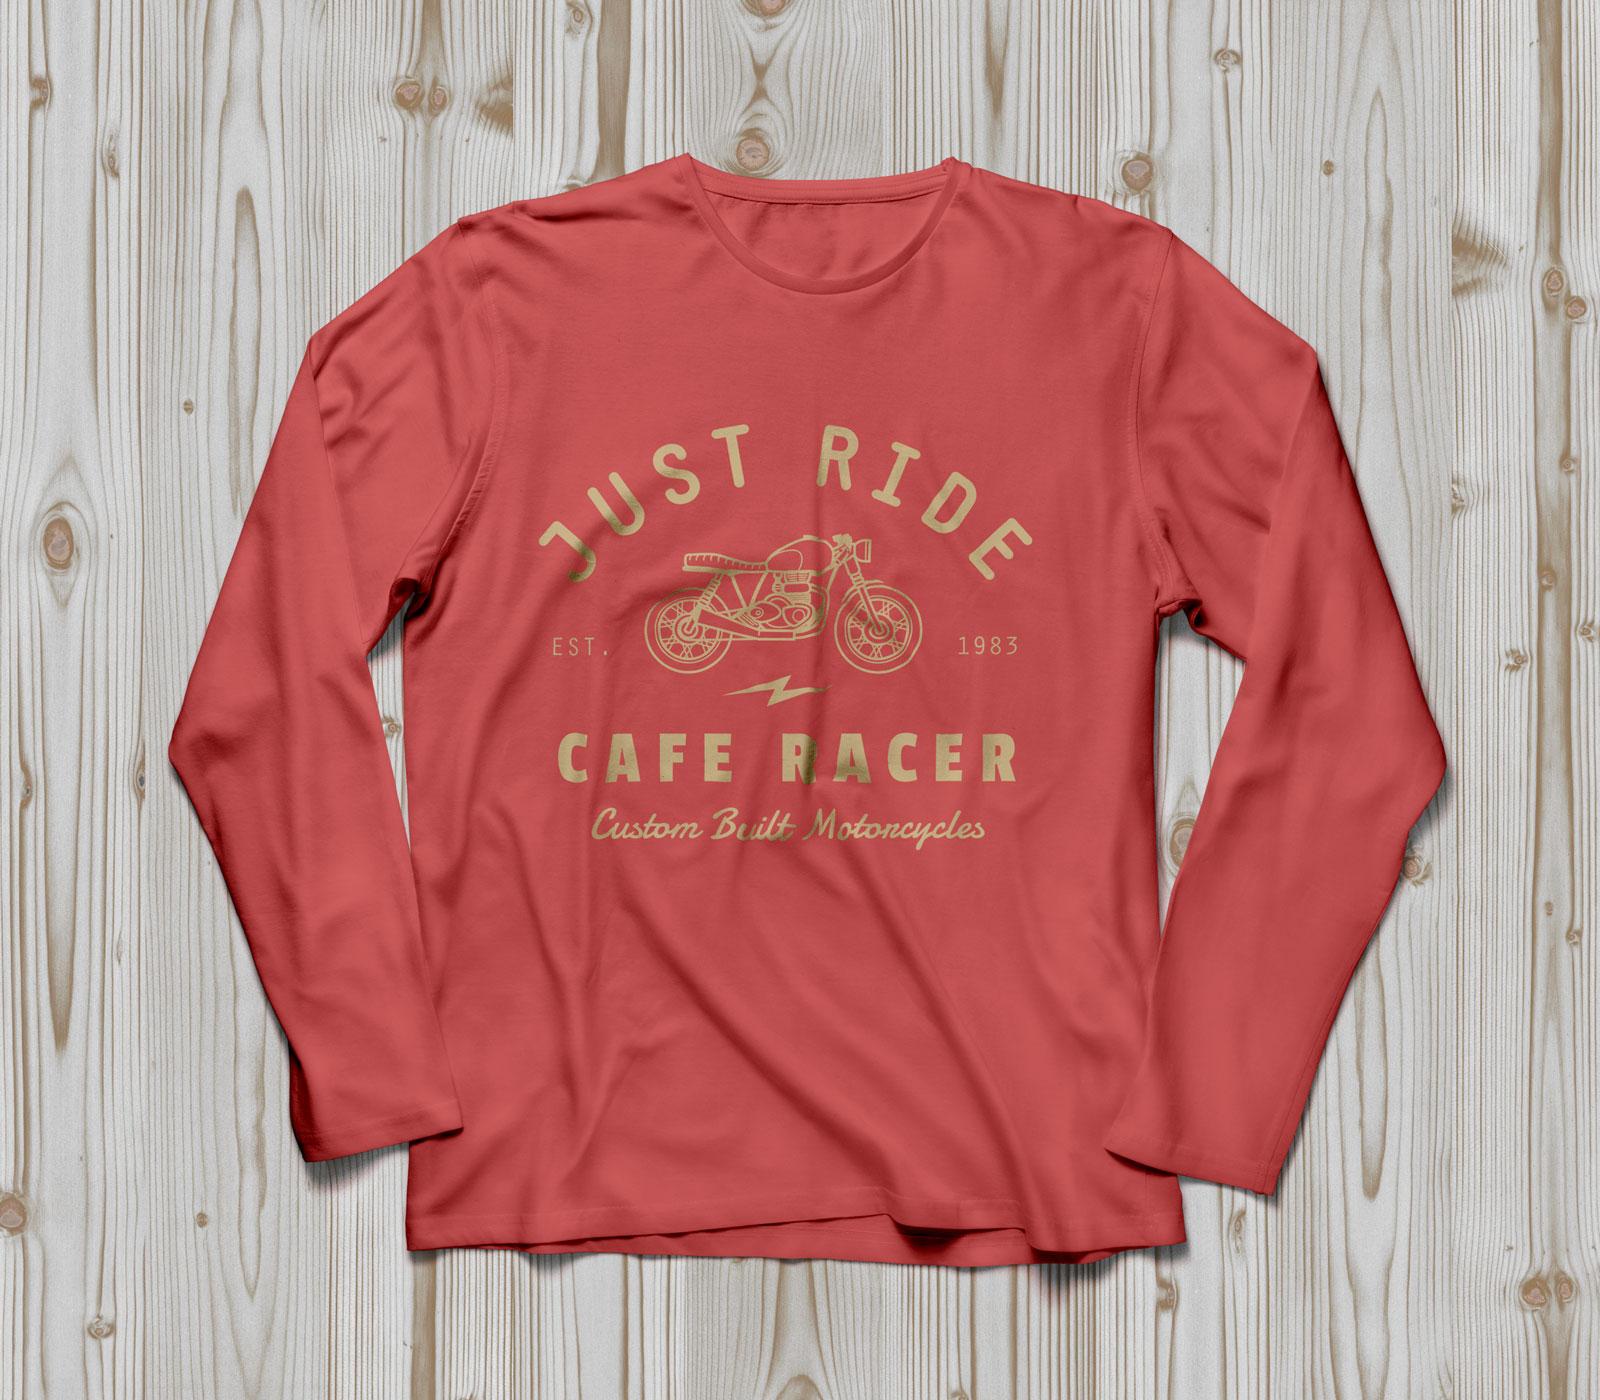 Free-Full-Sleeves-T-shirt-Mockup-PSD-Red